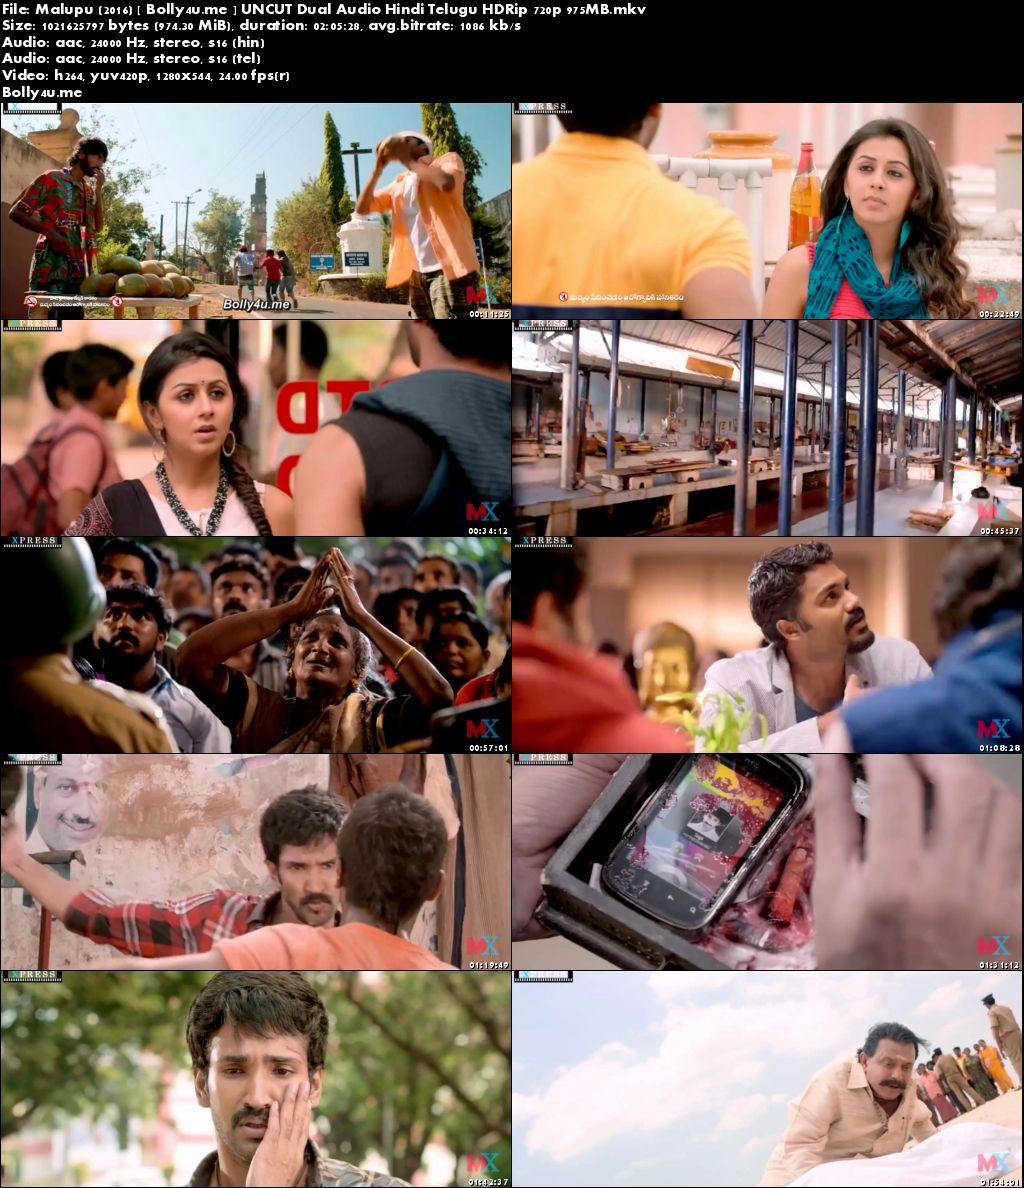 Malupu 2016 HDRip 950MB UNCUT Hindi Dual Audio 720p Download